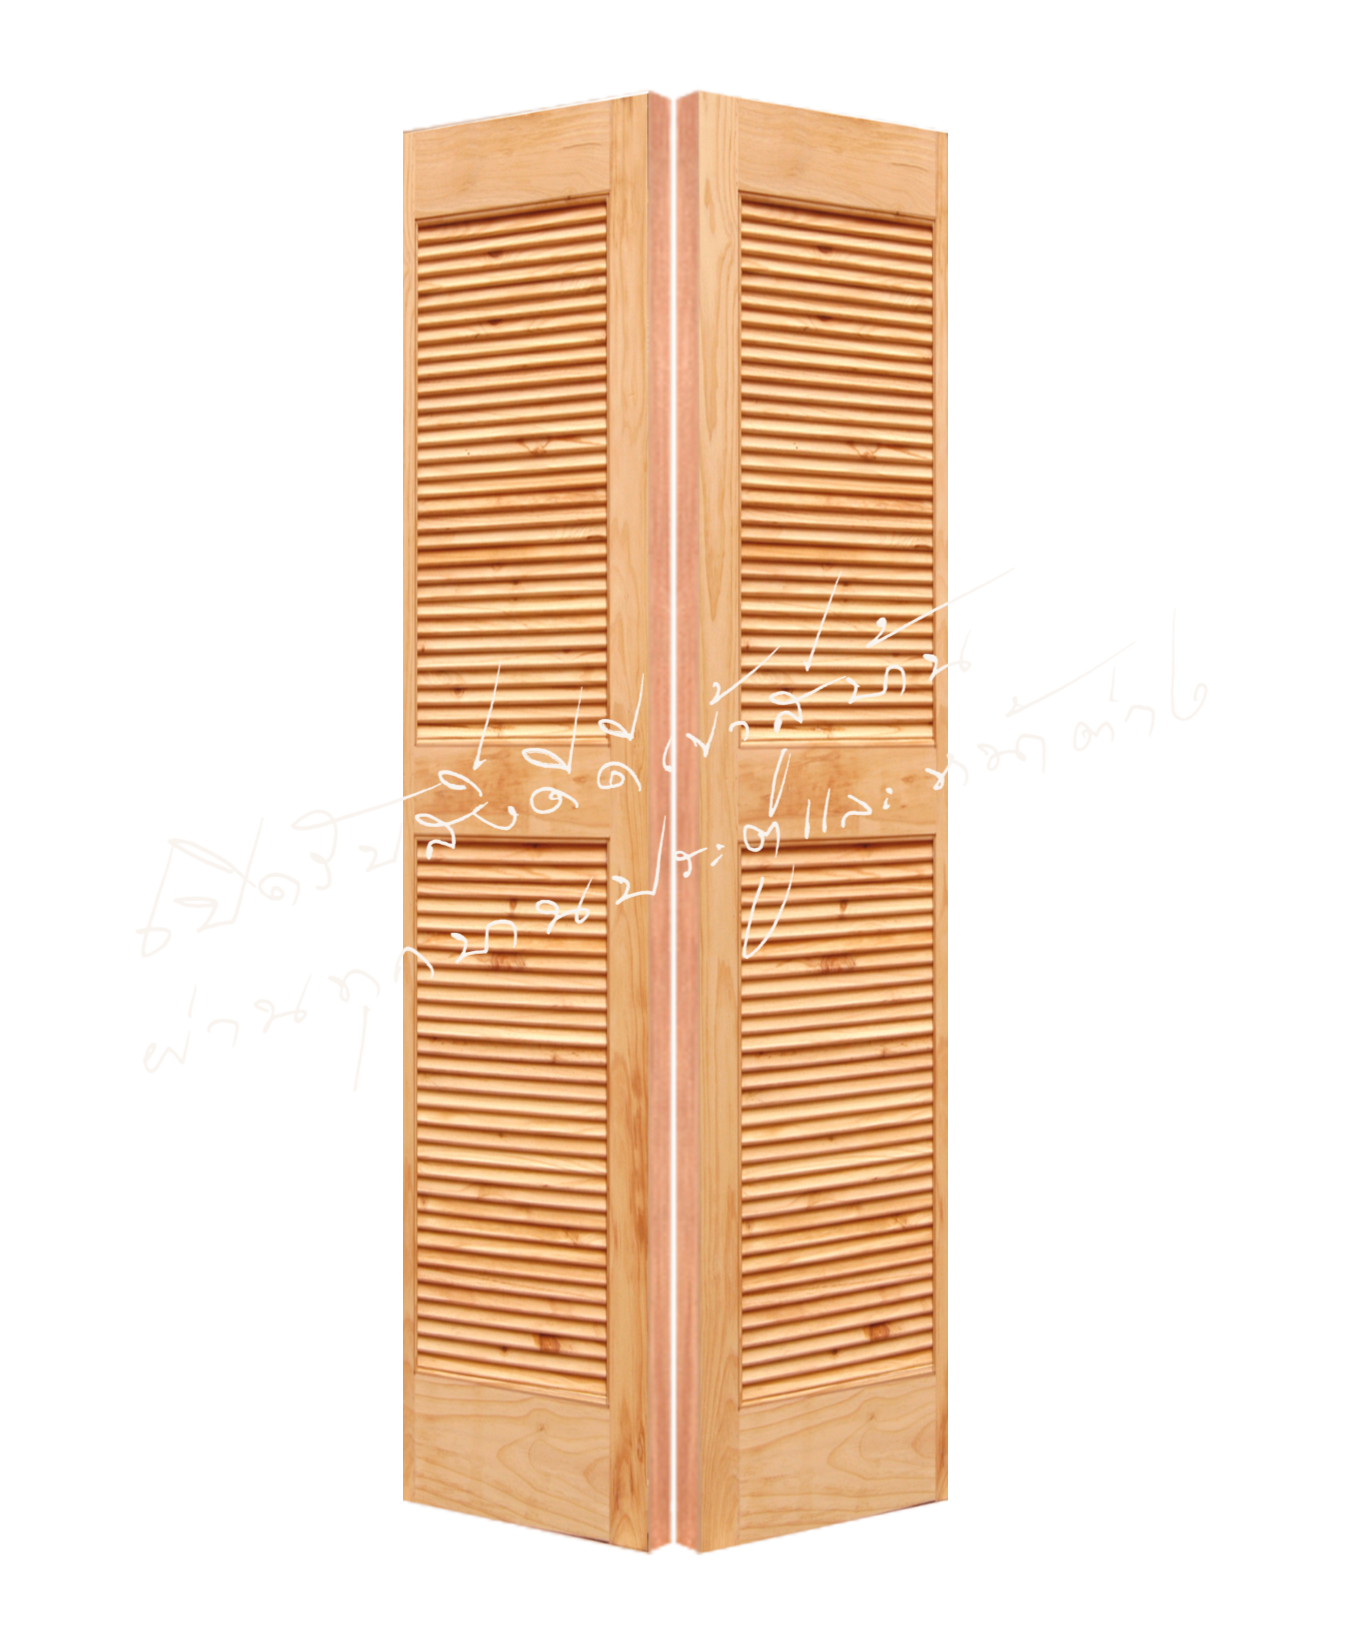 SL150 บานเฟี้ยม ไม้สนนิวซีแลนด์